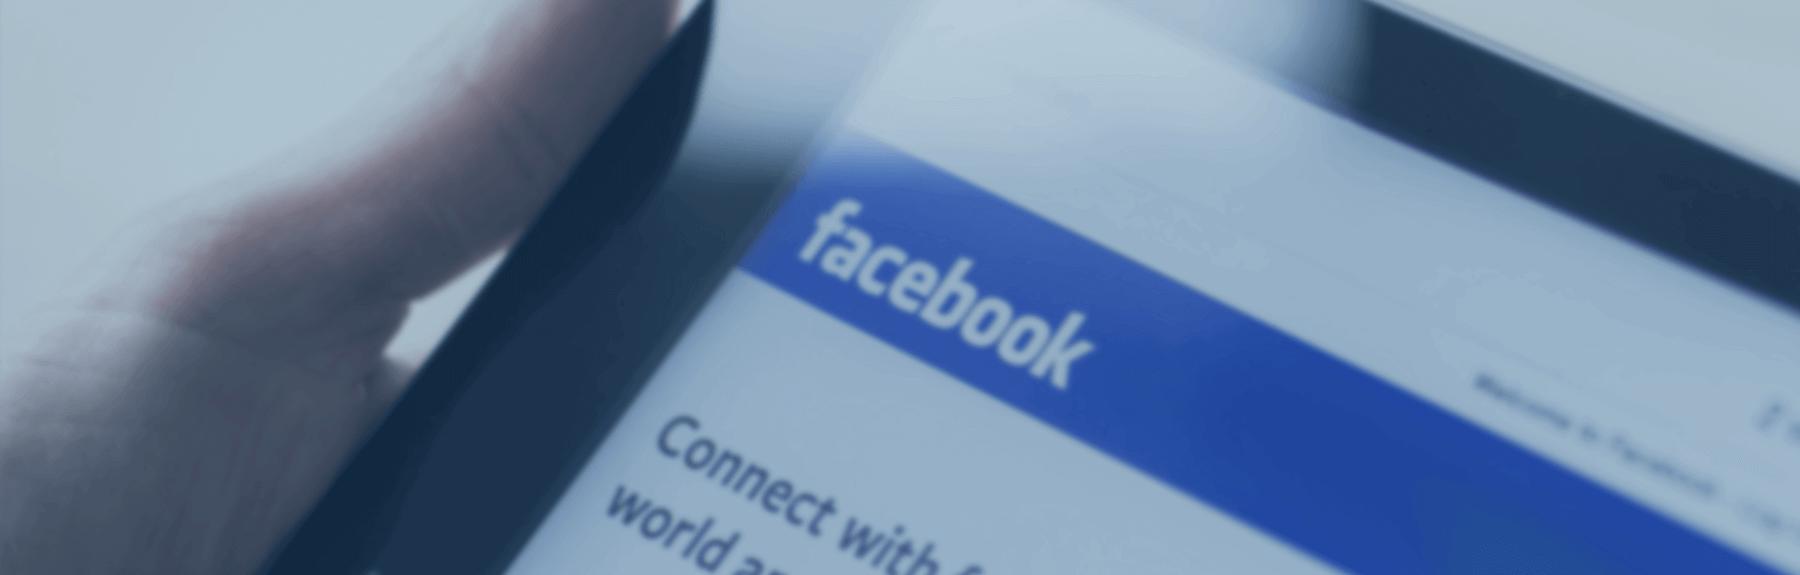 best-facebook-ux-groups-ux-best-practices